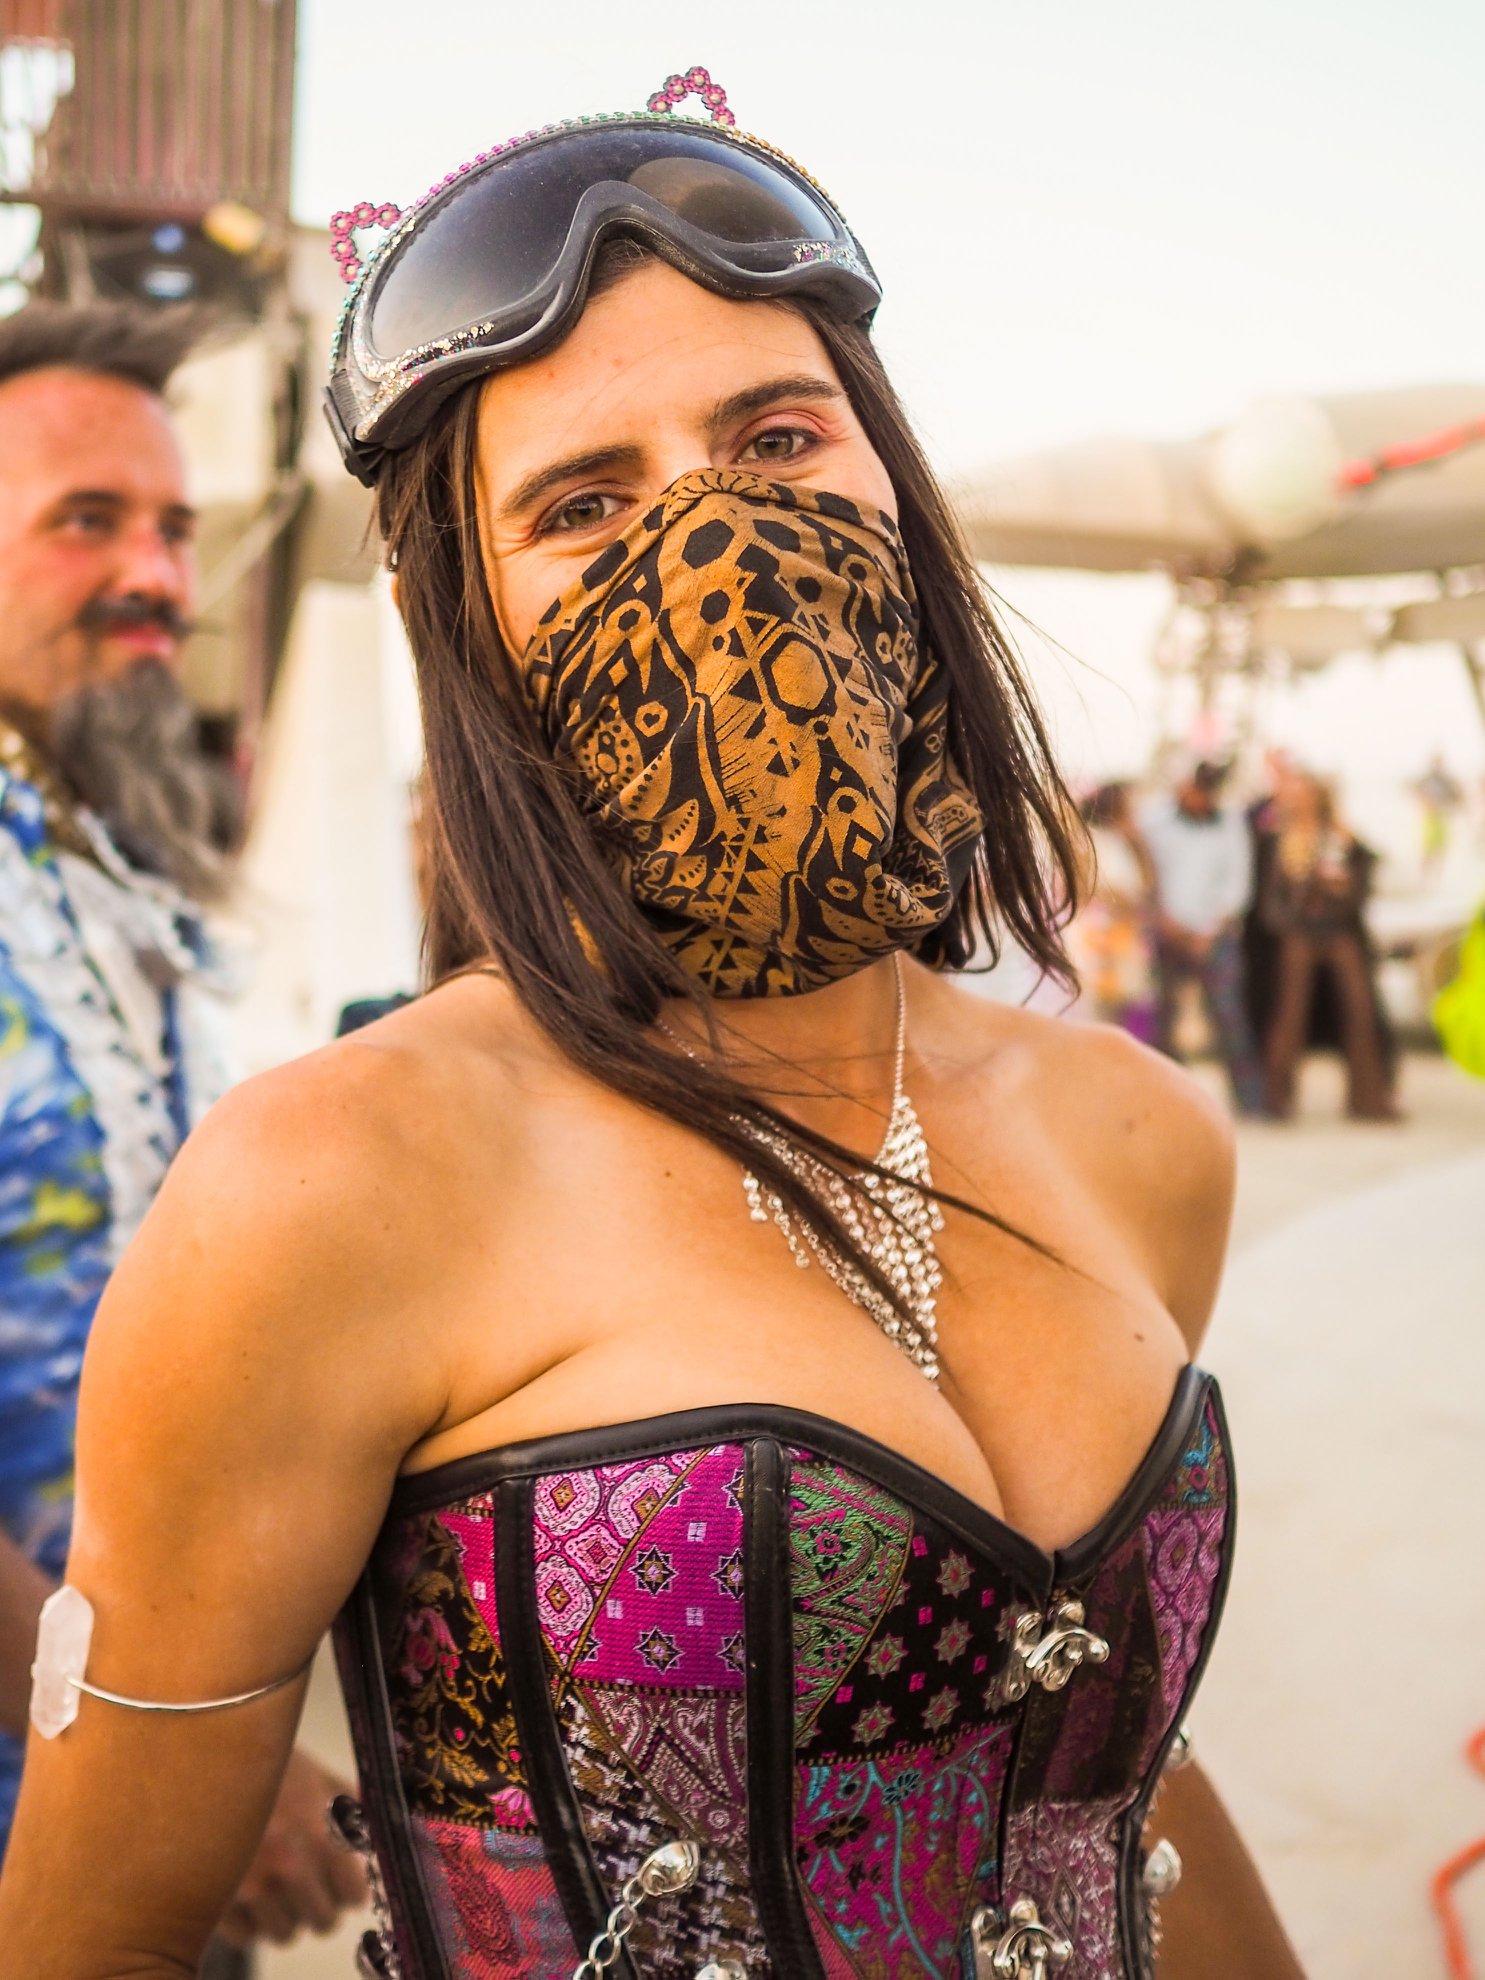 Skullptress jewelry, burning man, festival fashion, gypsy goddess